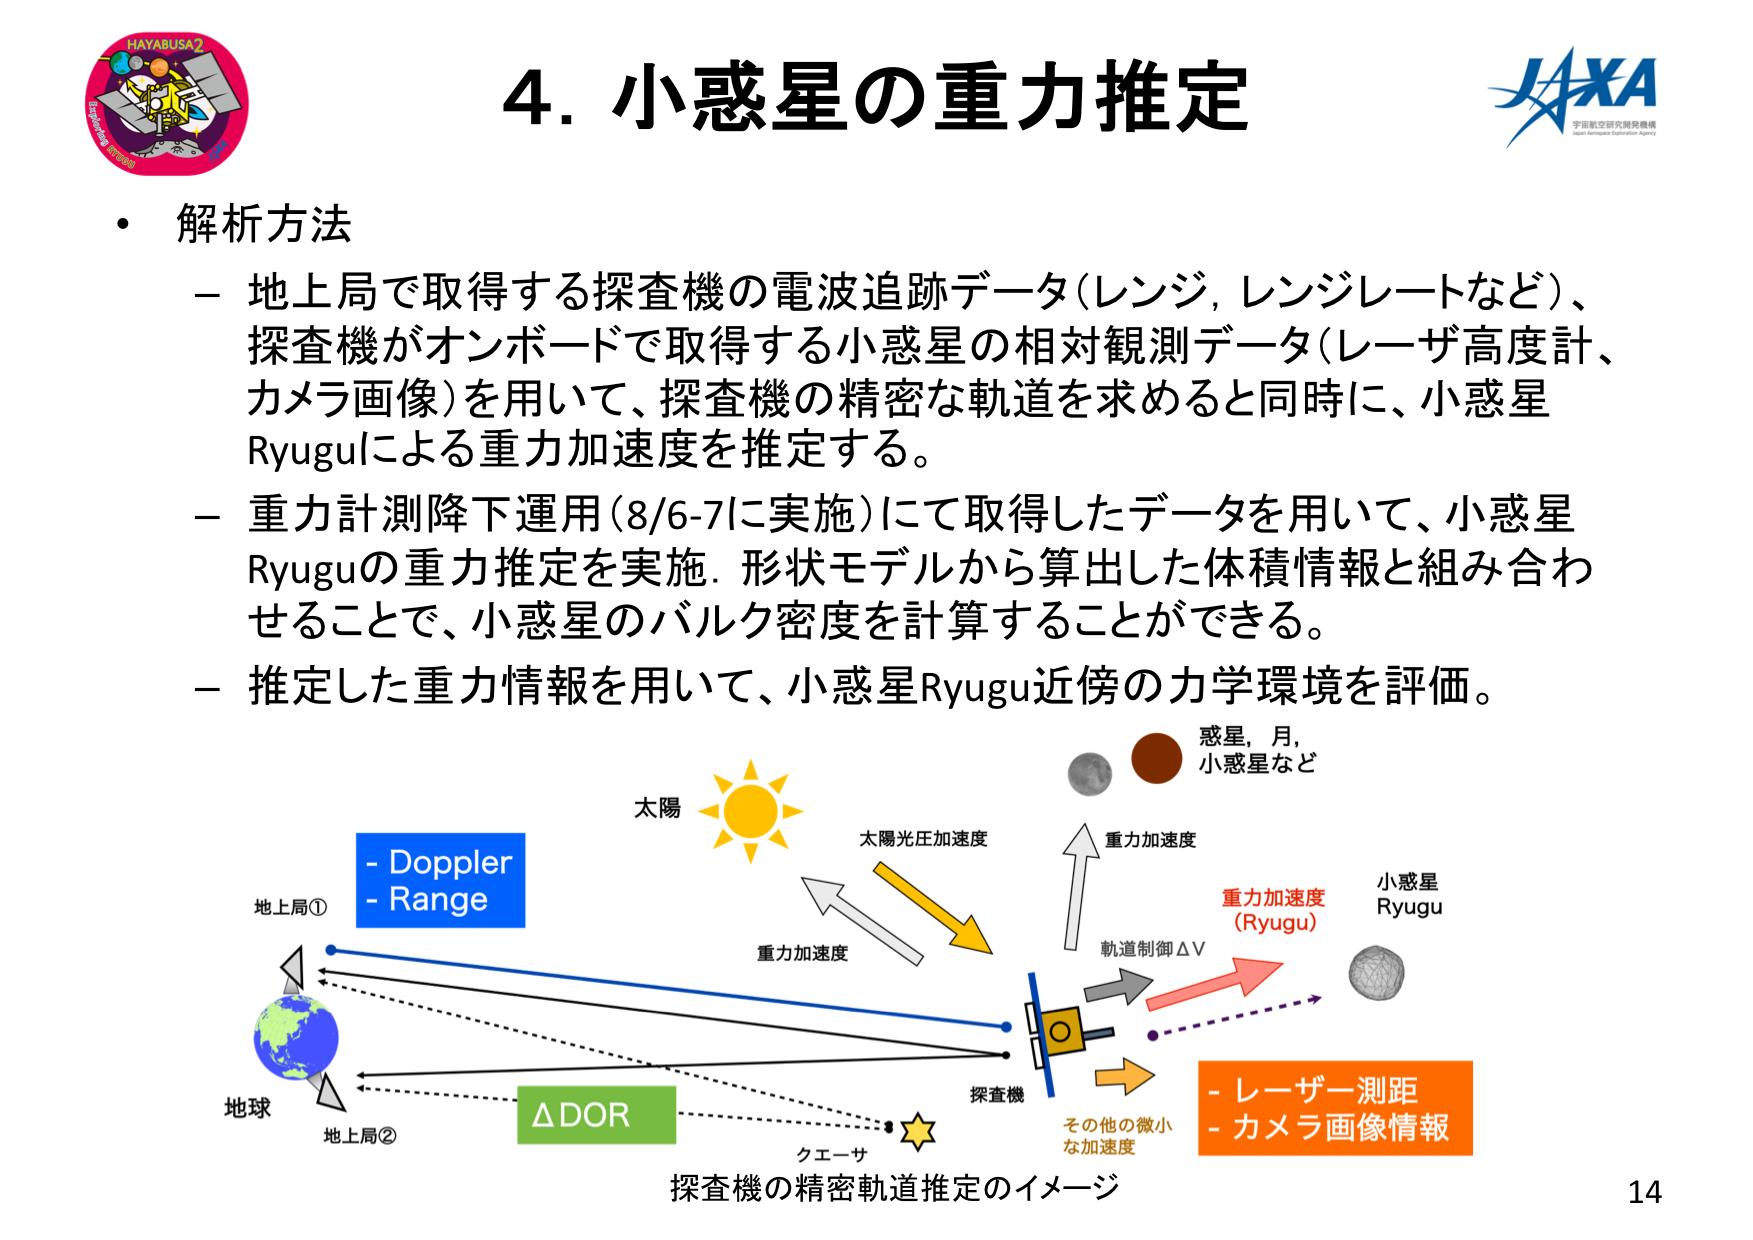 f:id:Imamura:20180905231946p:plain